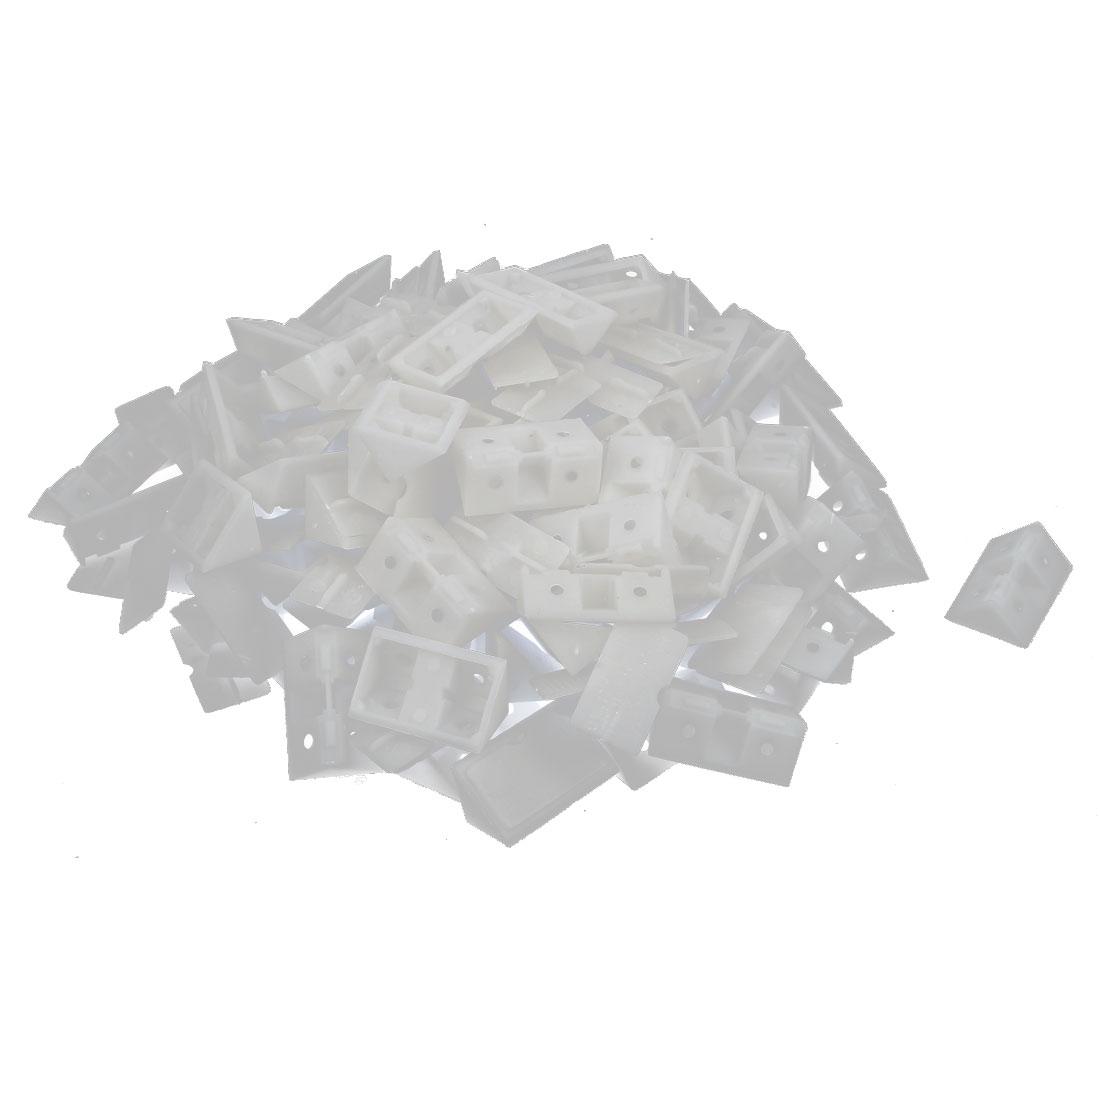 100pcs White Plastic Closet Cabinet 4 Holes Shelf Corner Brace Joint Brackets Support